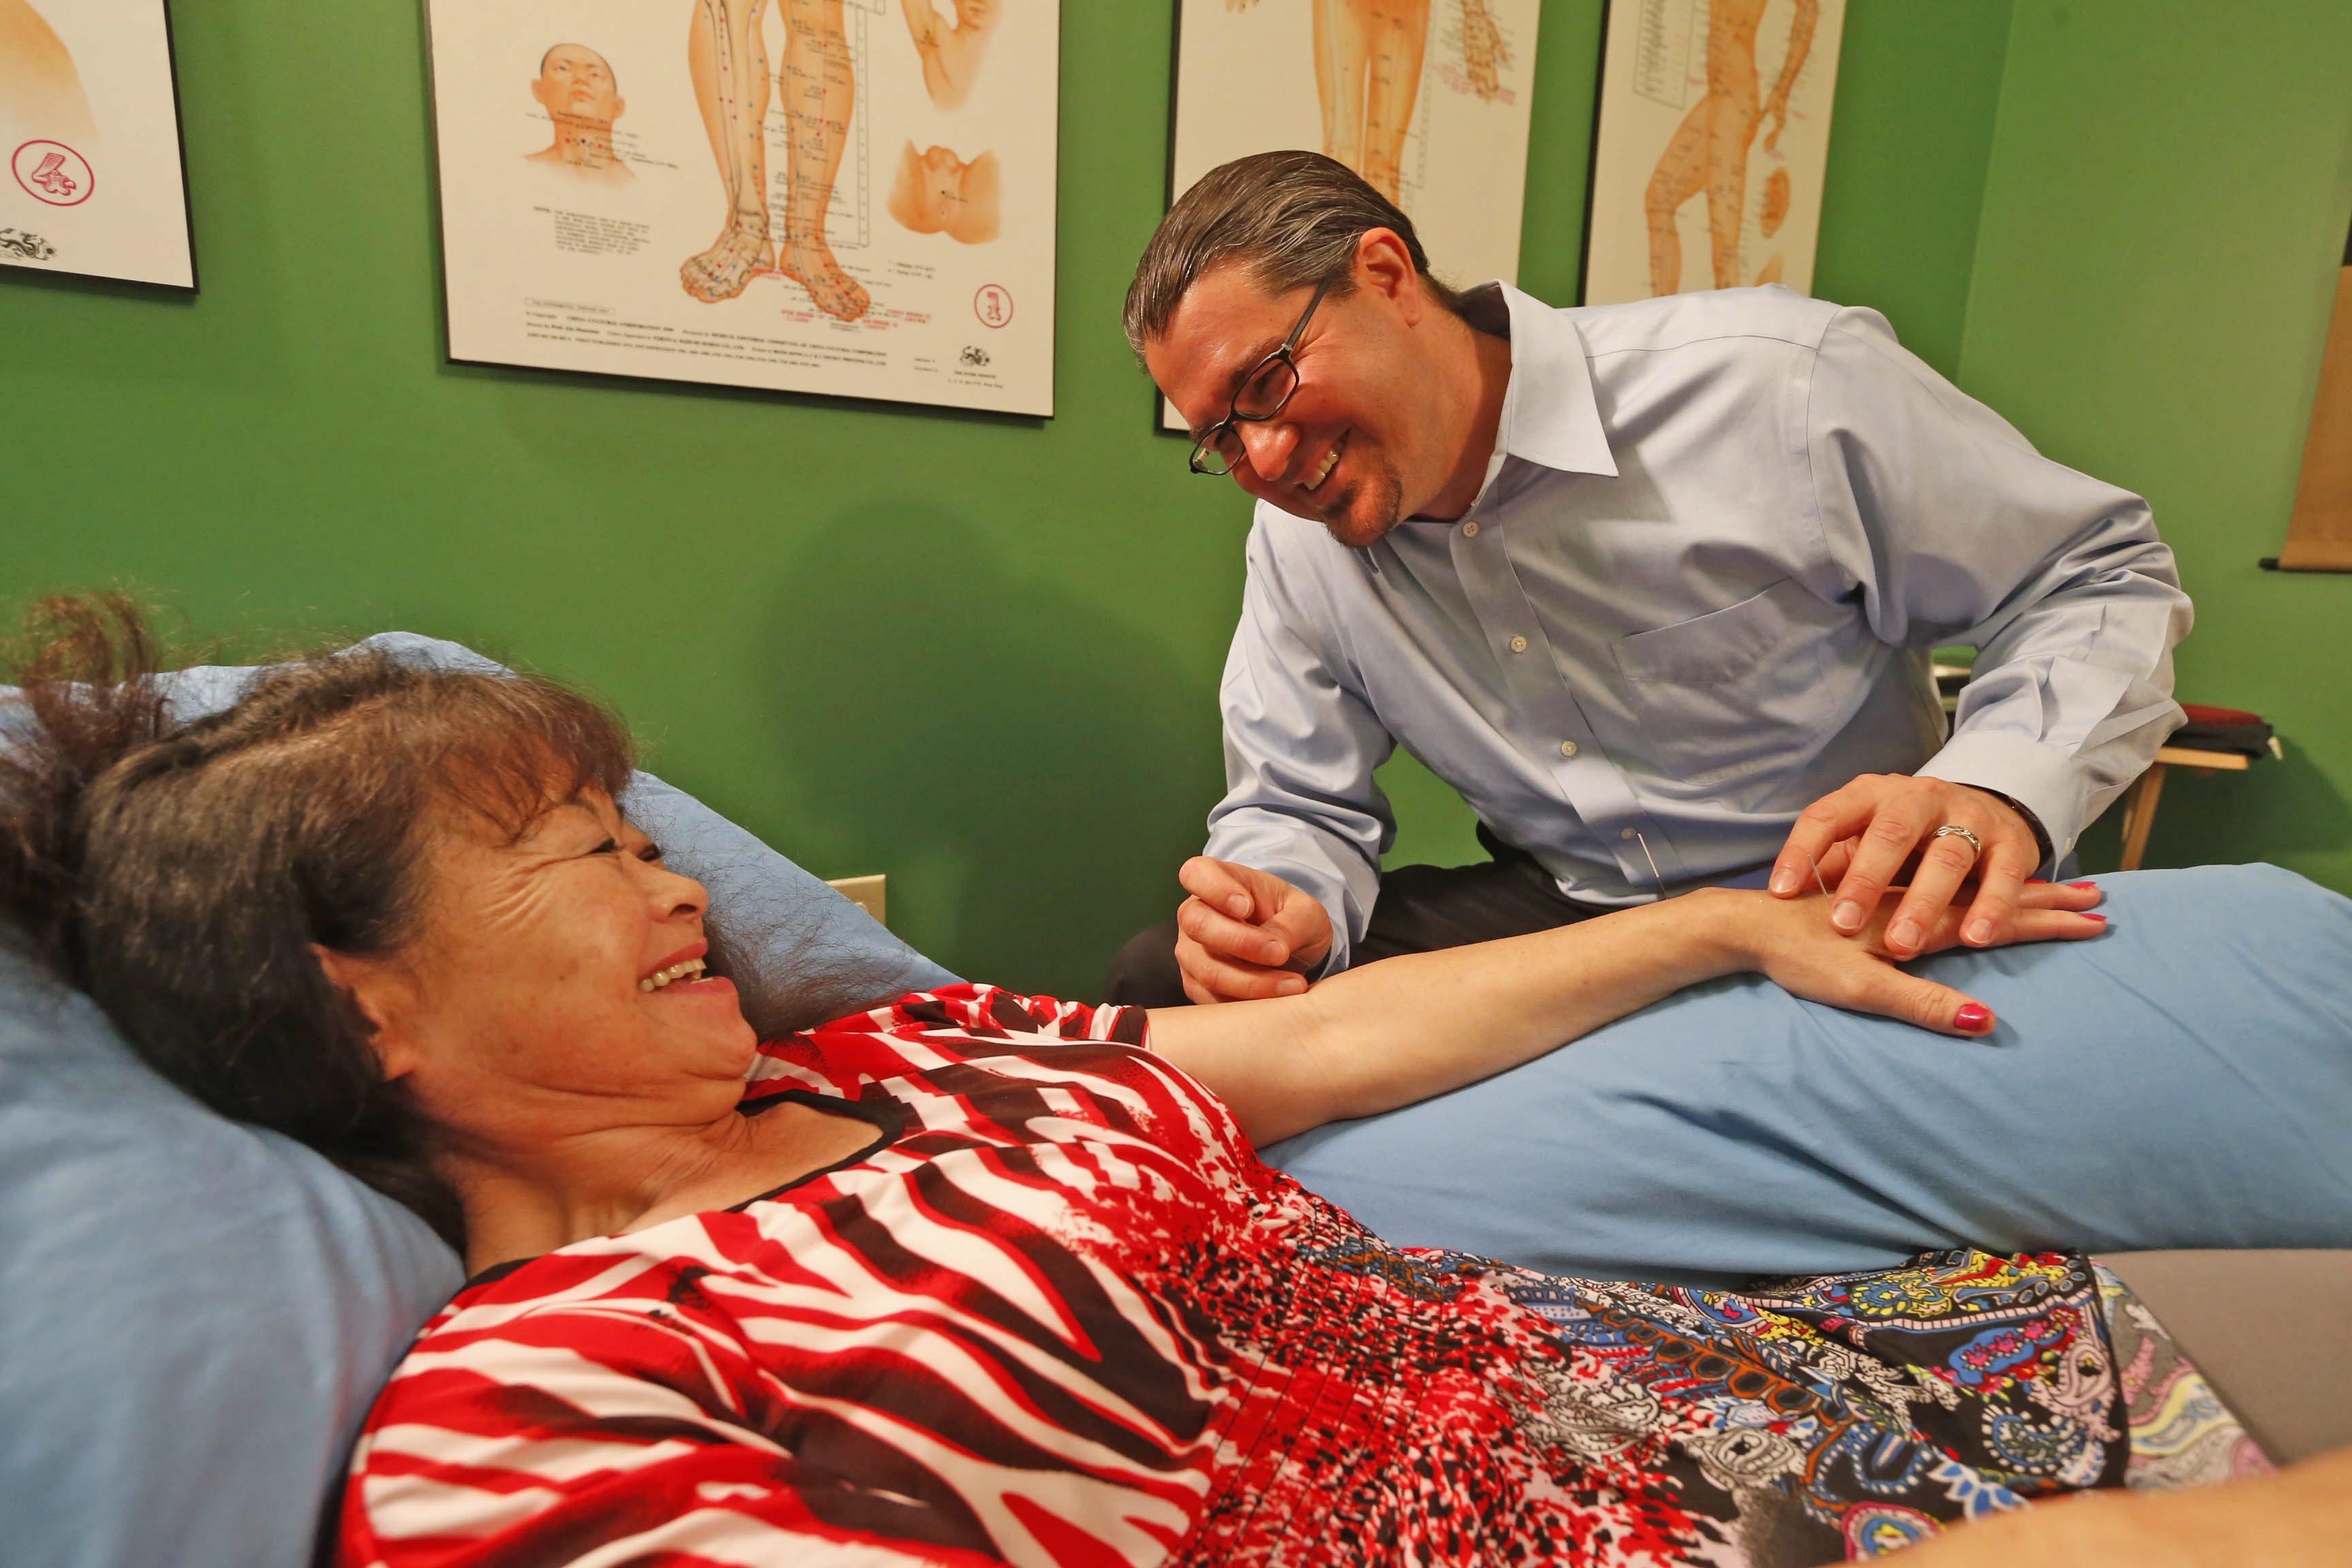 Acupuncturist Destin Radder works with patient Soni Williams, of Getzville, in his Lewiston office July 15. Radder is celebrating his first aniversary in Lewiston.